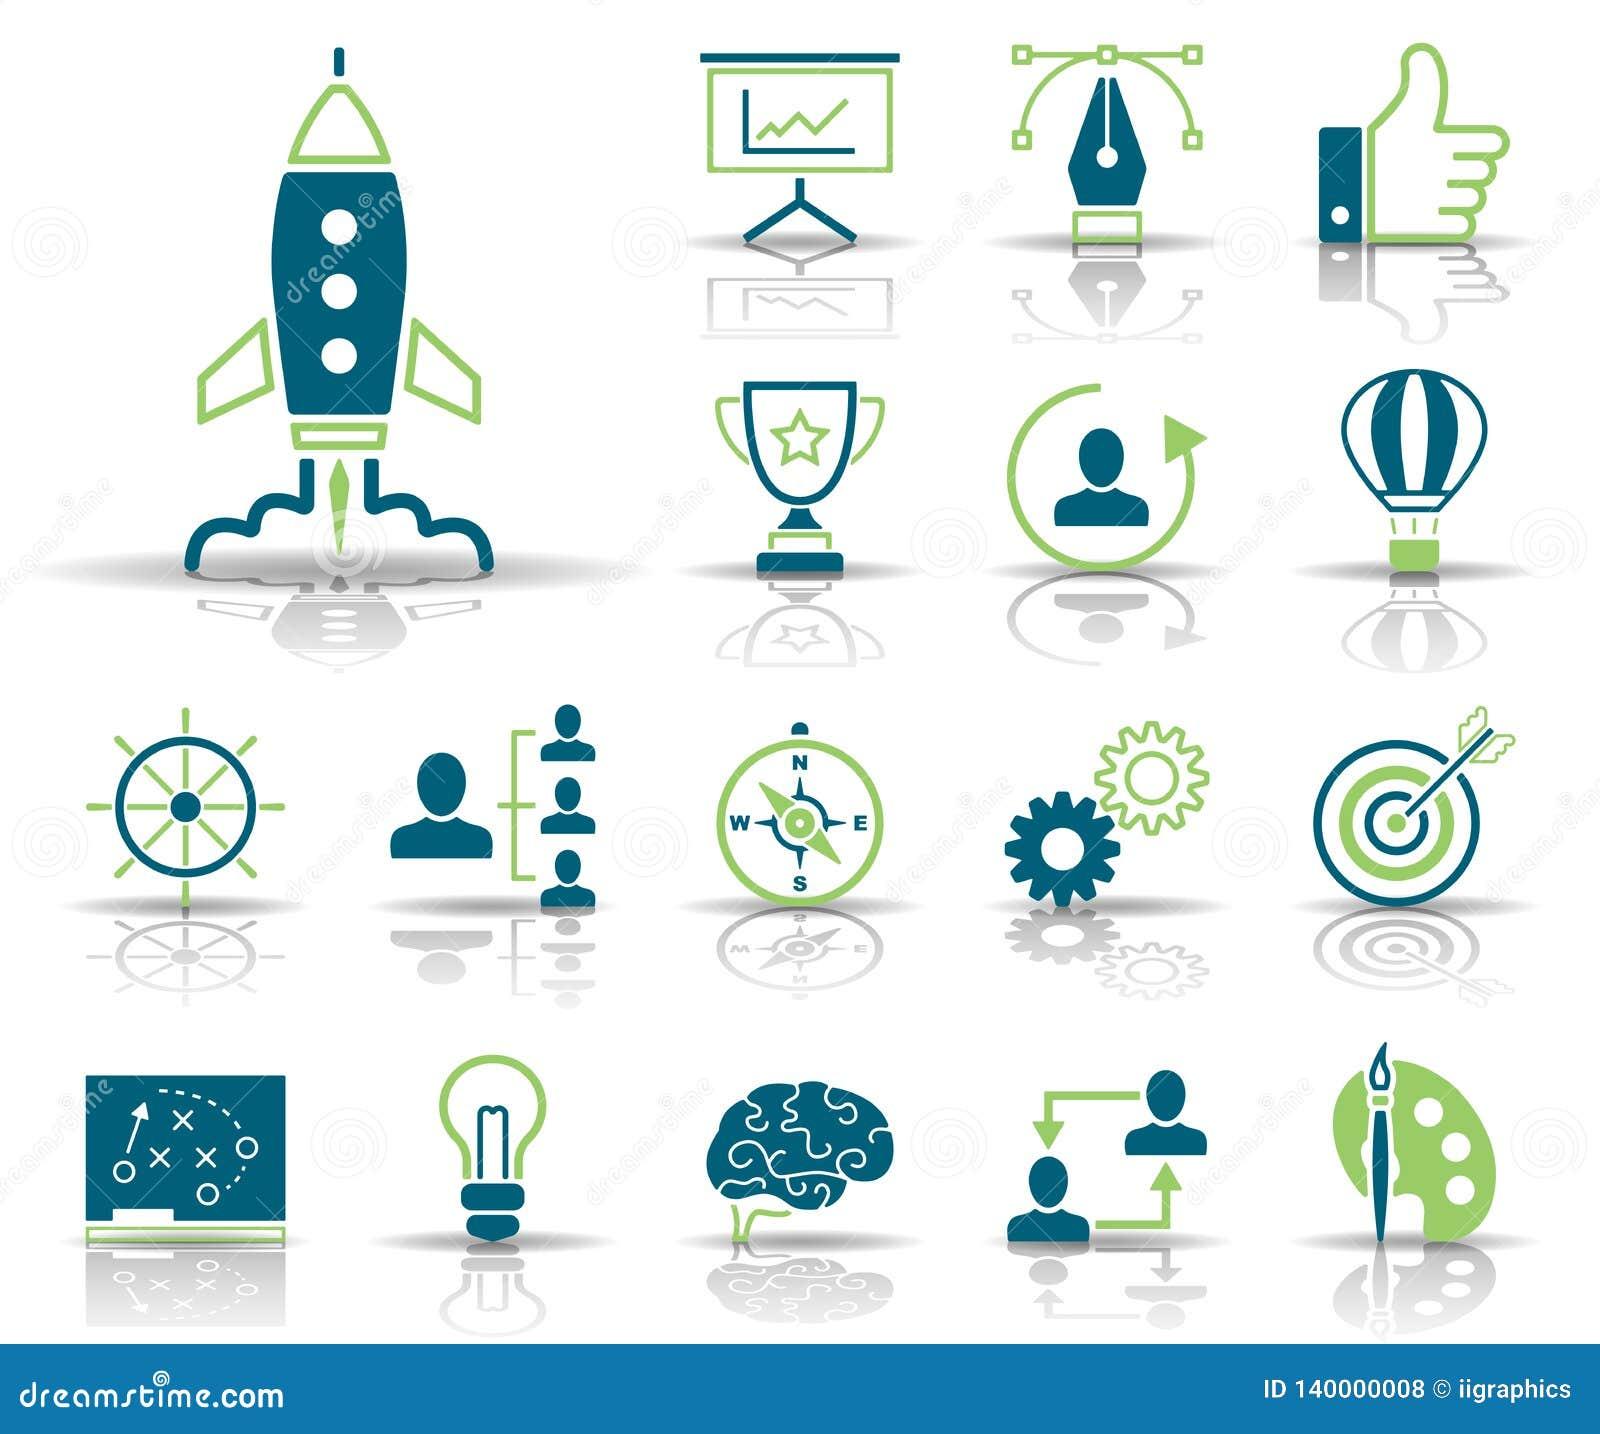 Strategi & kreativitet - Iconset - symboler